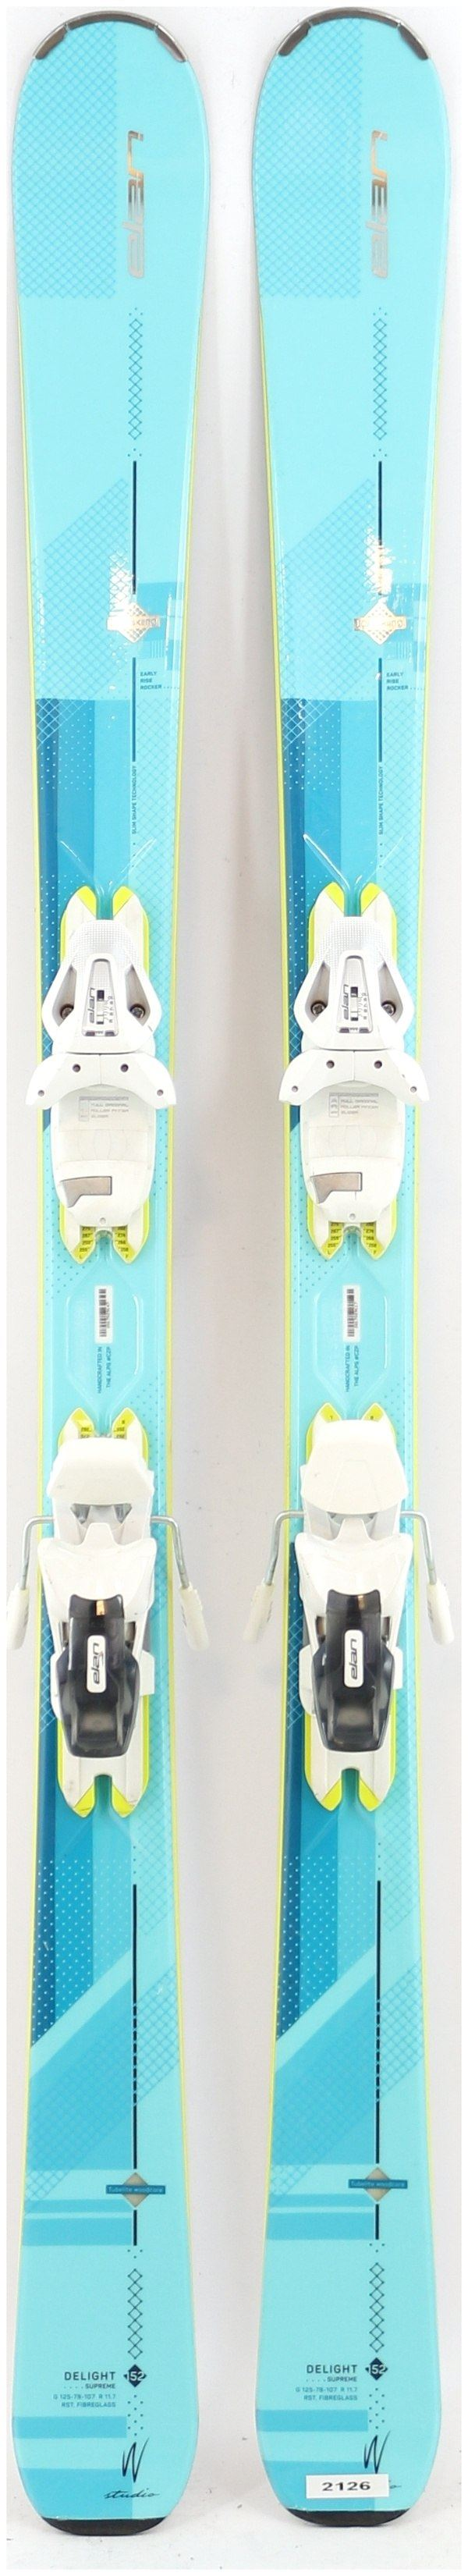 2018 Elan Delight Supreme 152cm Used Demo Skis On Sale   Powder7